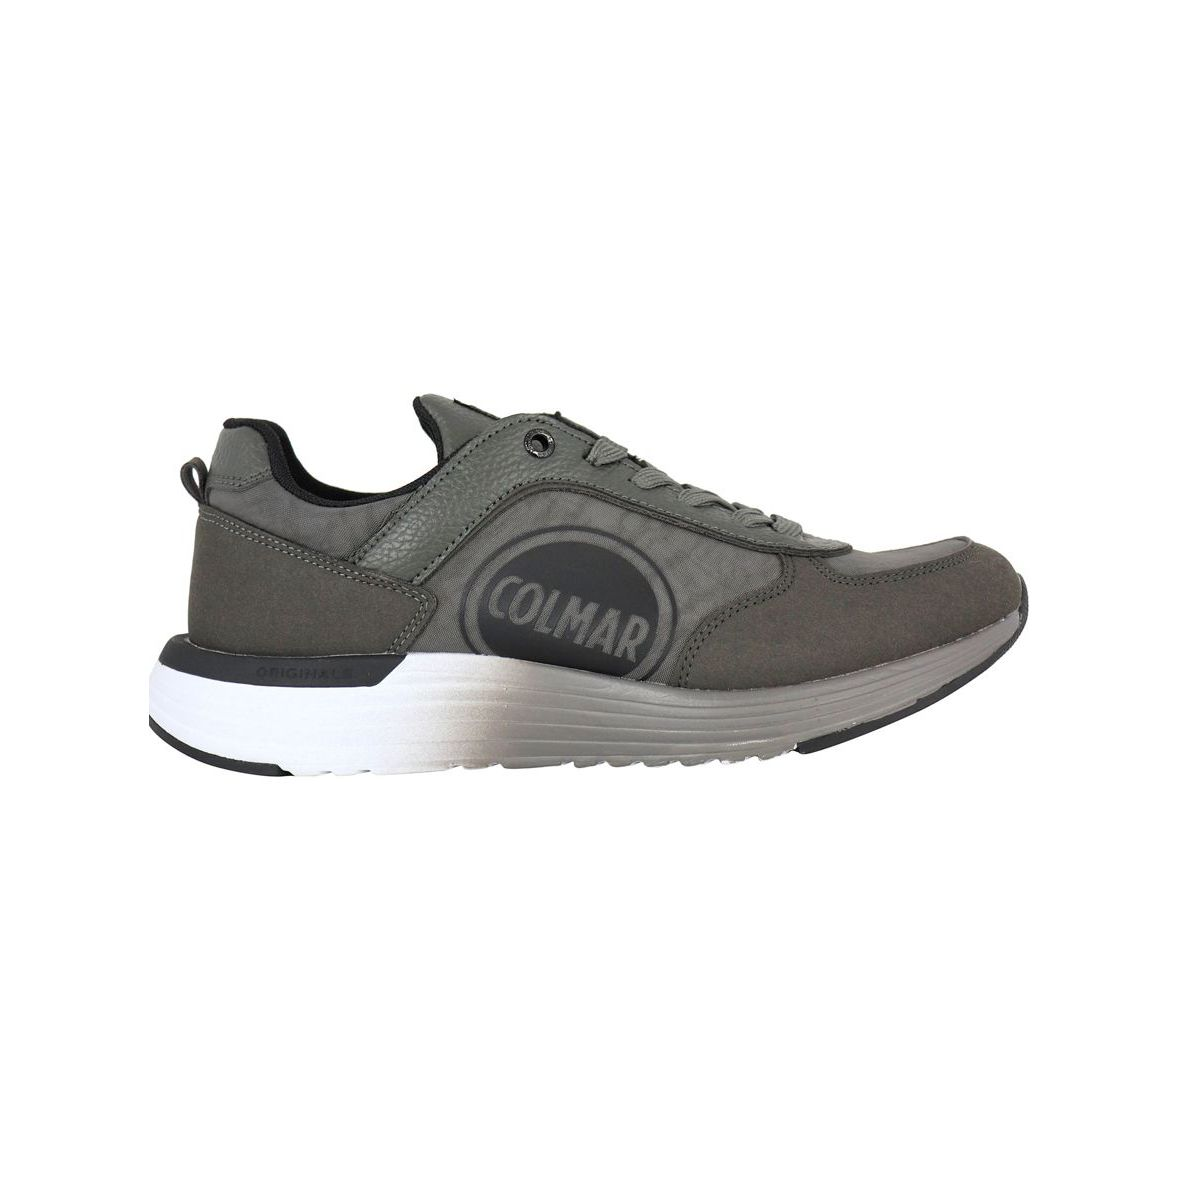 Magma sneakers Grey Colmar Shoes